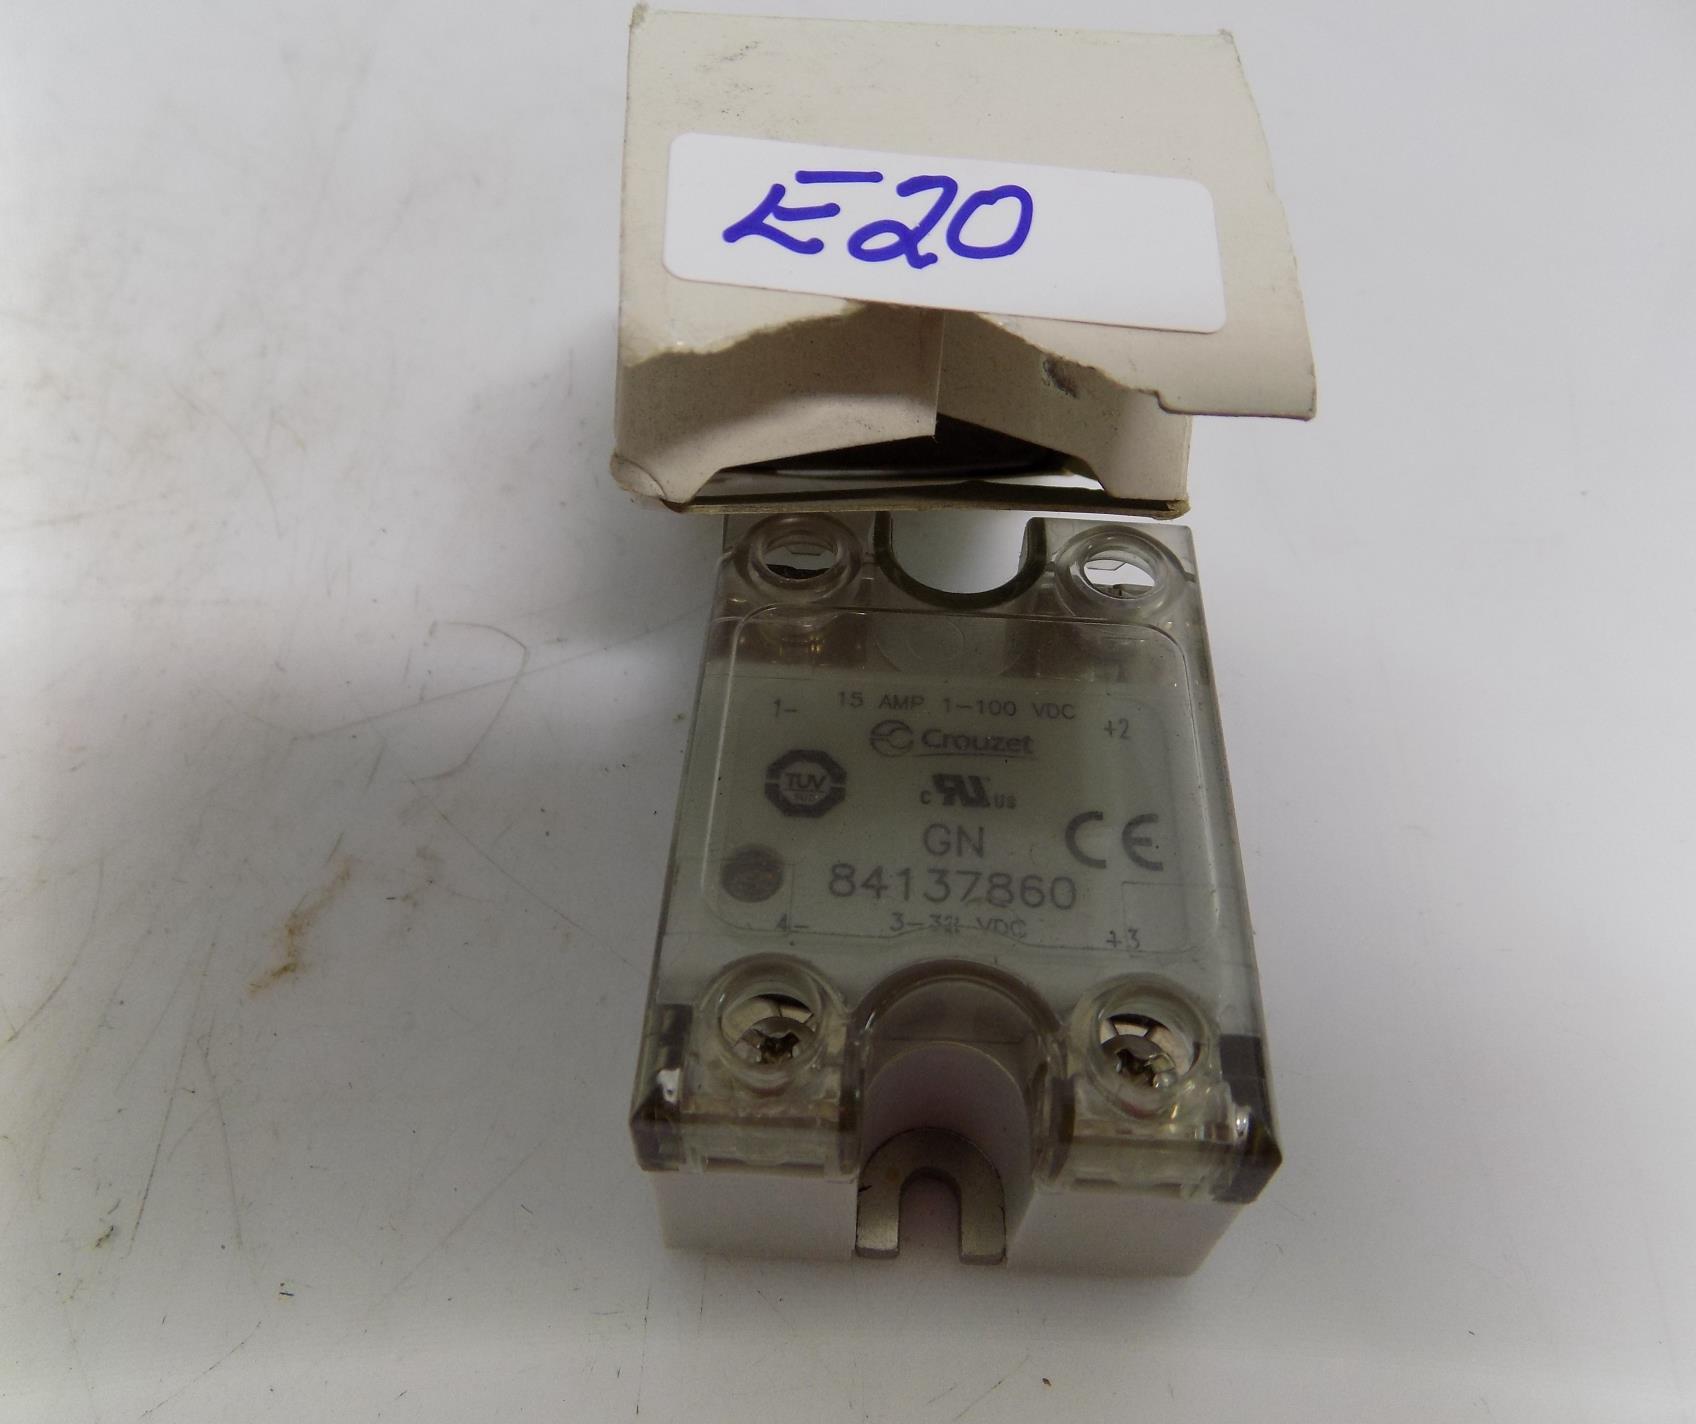 Opto 22 mount OAC24 18-32VDC input 3A 120V AC Output Relay Crouzet Gordo I//O